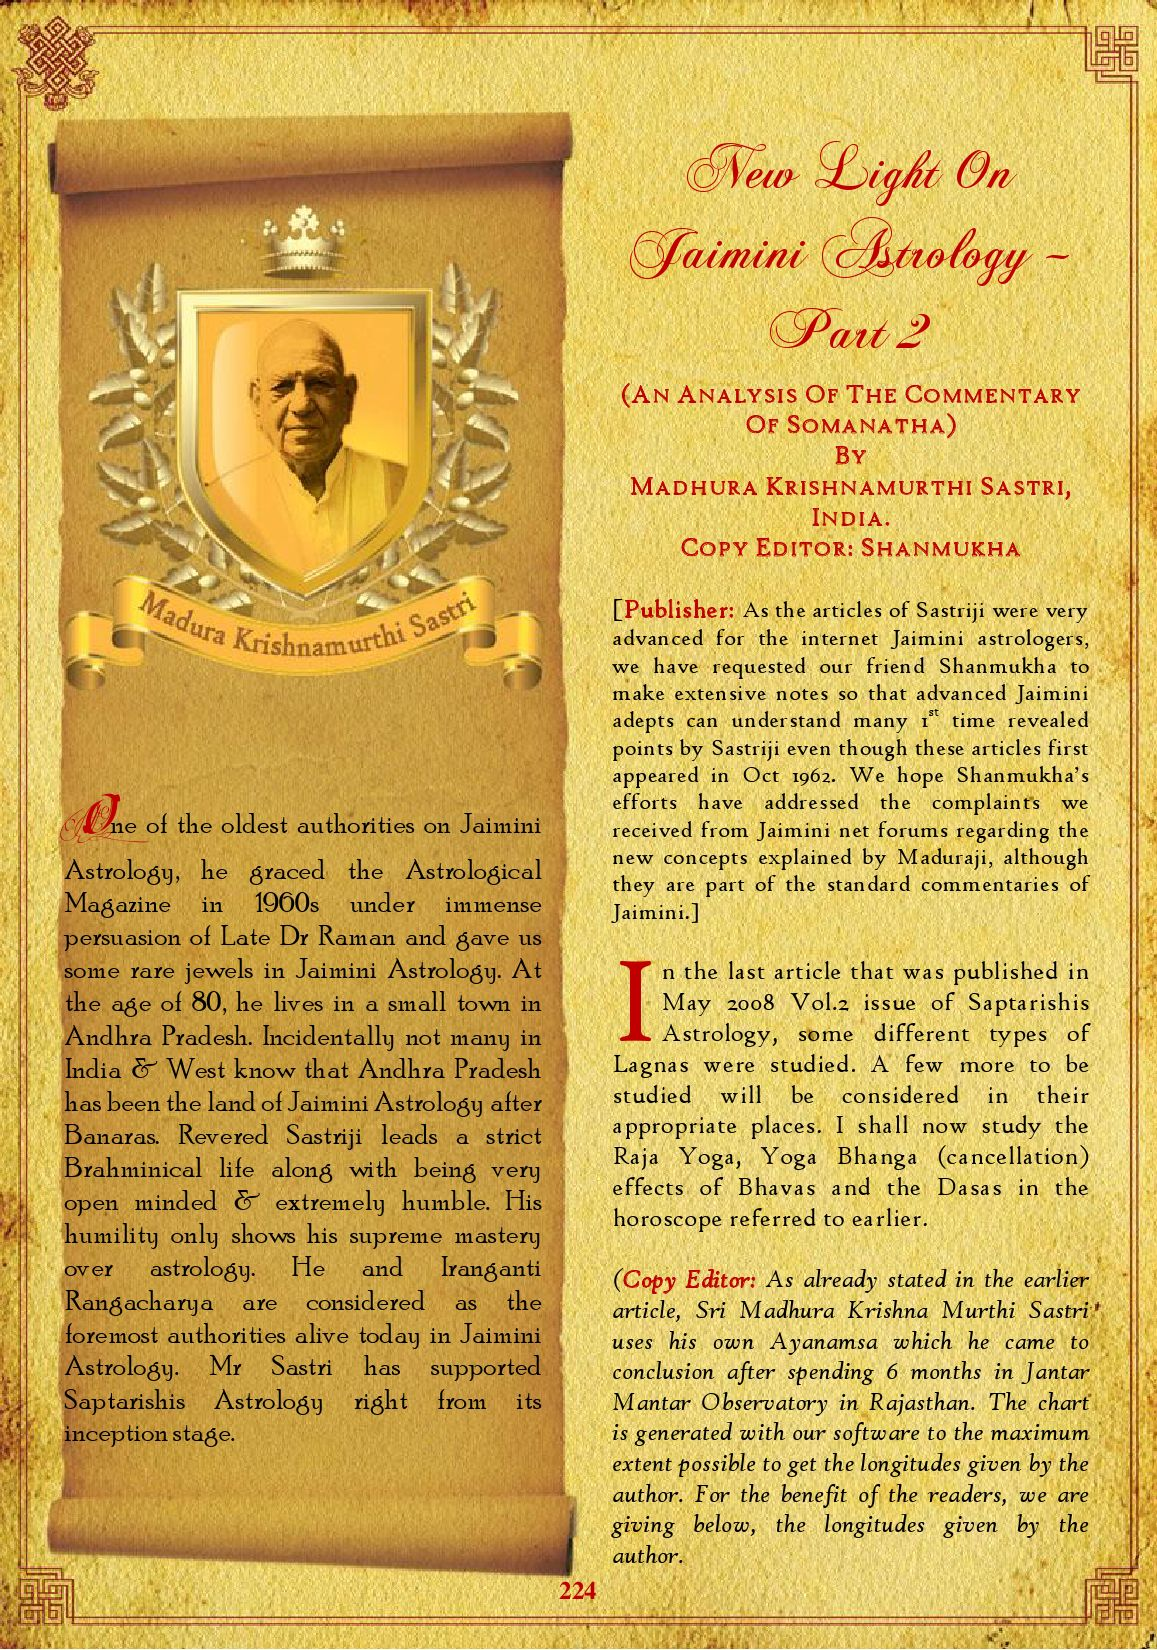 Horoscope male or female by saptarishis astrology issuu new light on jaimini astrology part 2 nvjuhfo Image collections